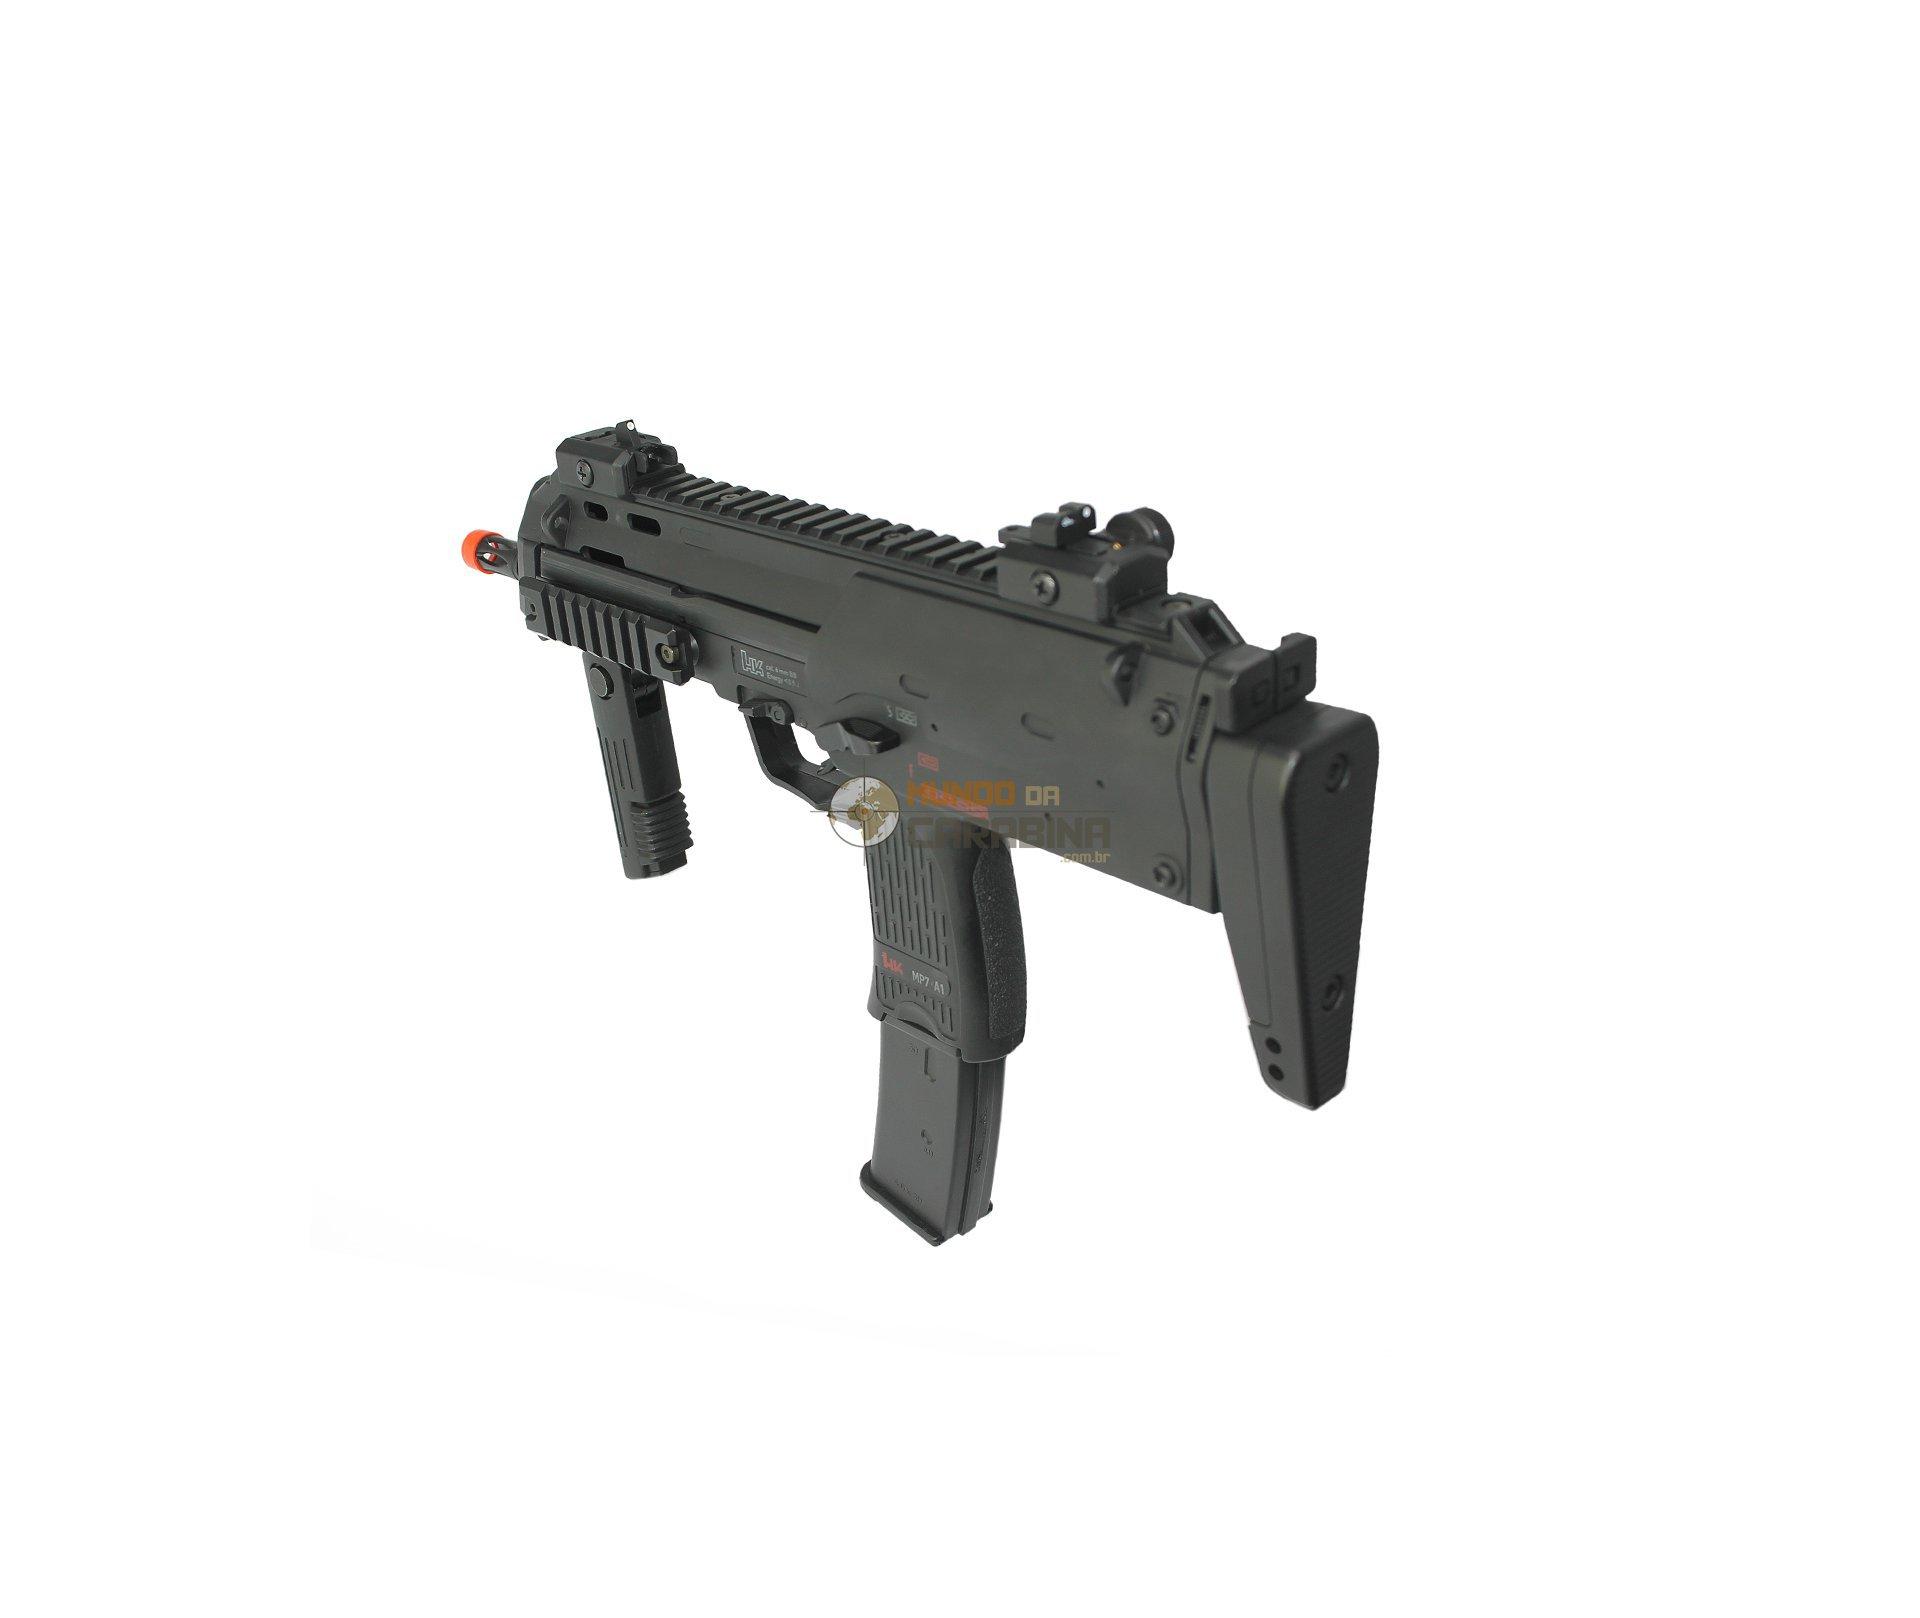 Rifle De Airsoft H&k Mp7 A1 Swat Full Metal 6mm - Bivolt - Umarex